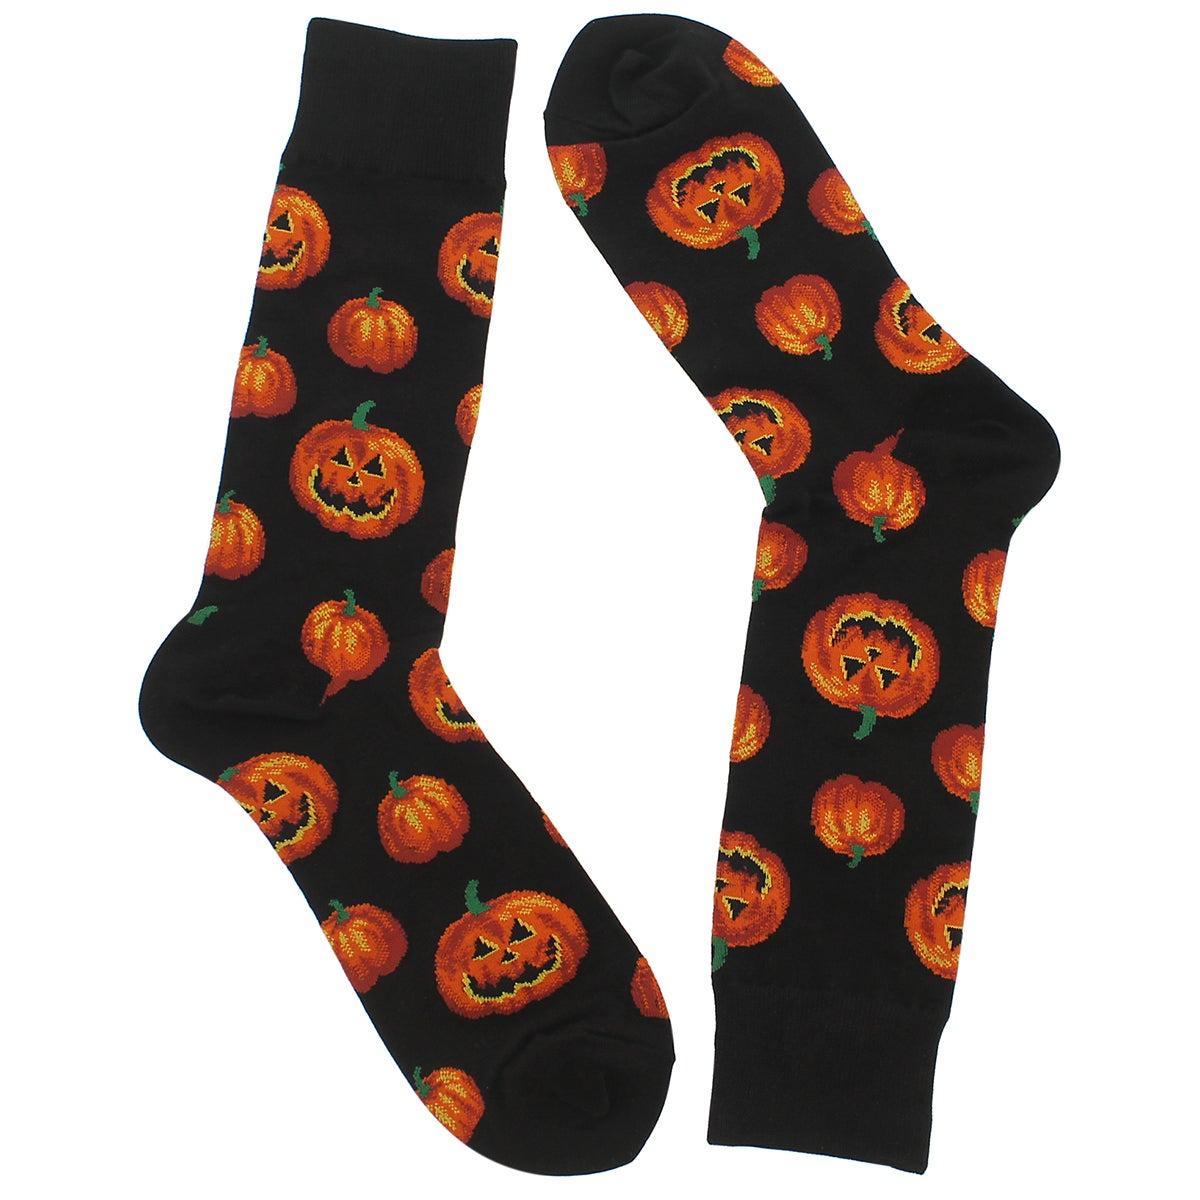 Mns Pumpkin blk/orange printed sock